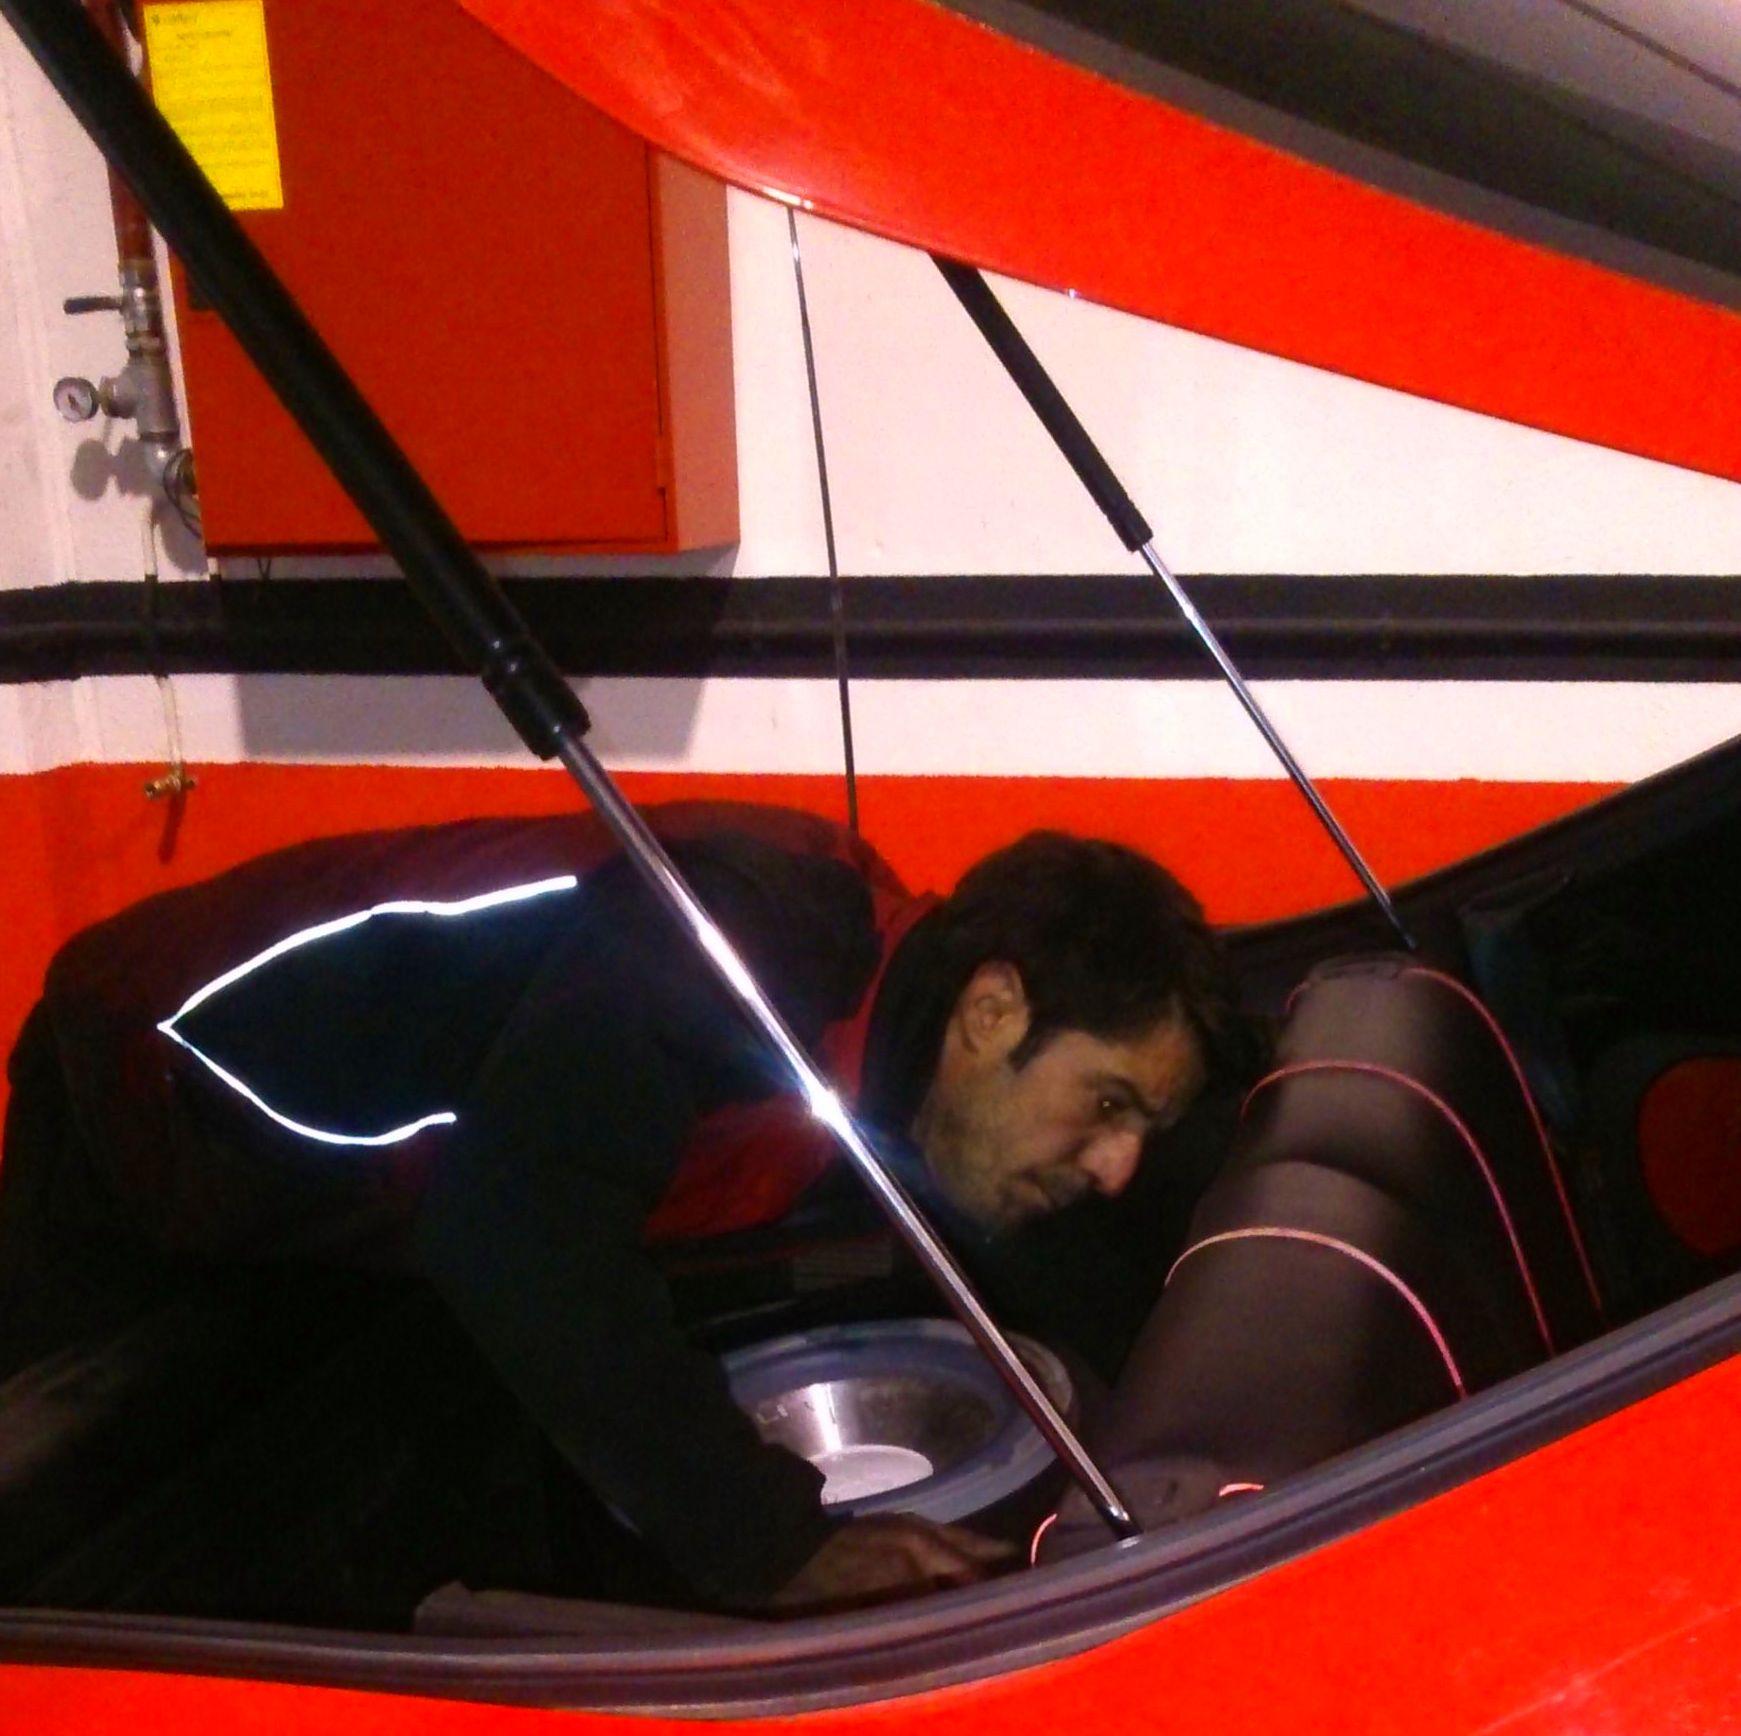 Foto 10 de Talleres de automóviles en Aranjuez | Talleres Multimarca ARB Express